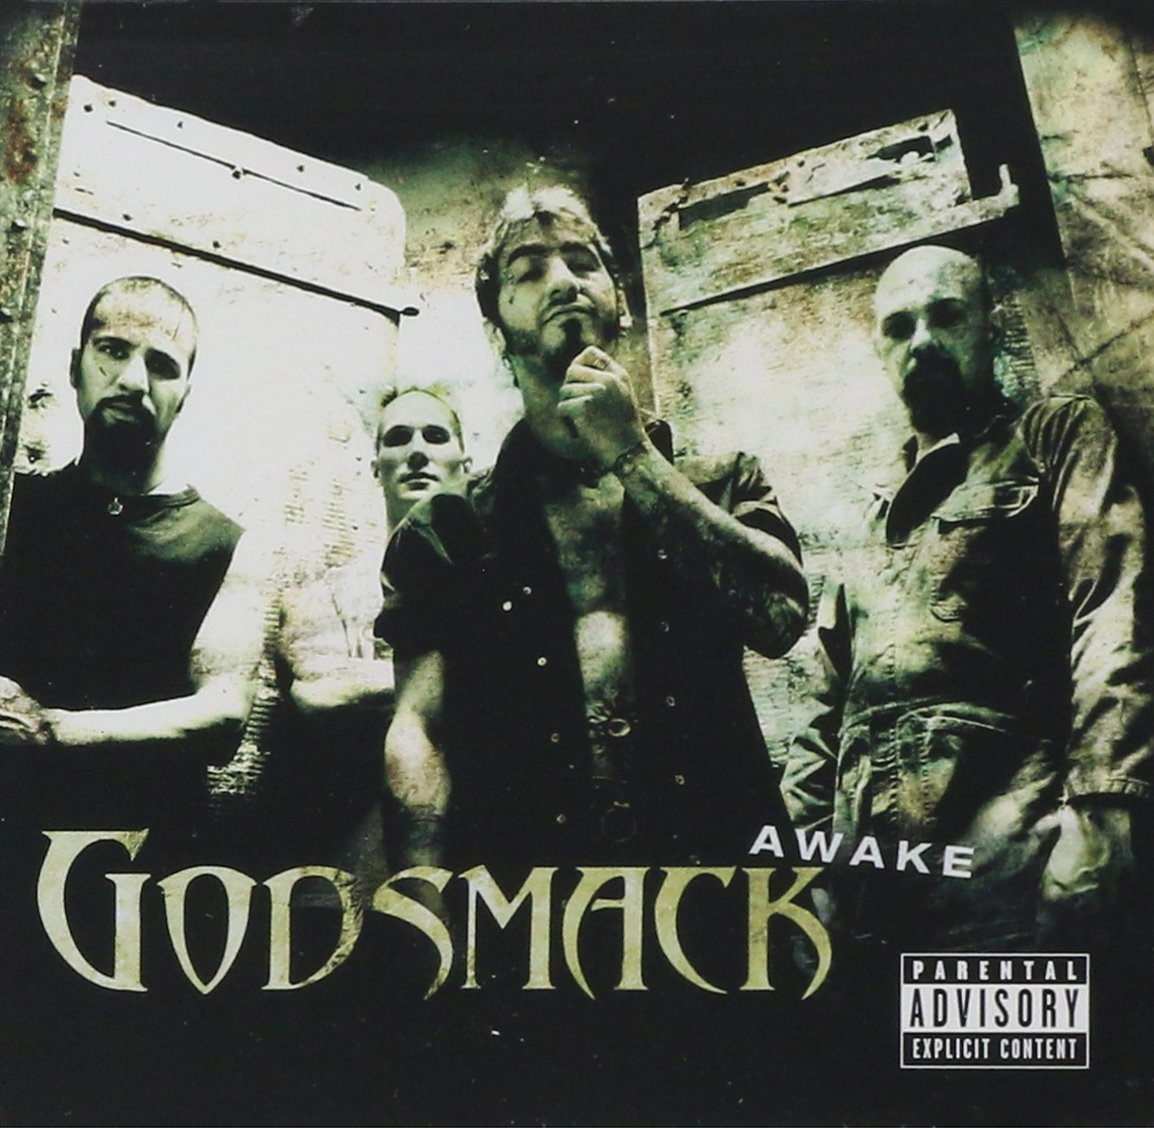 Godsmack - Awake (2000)